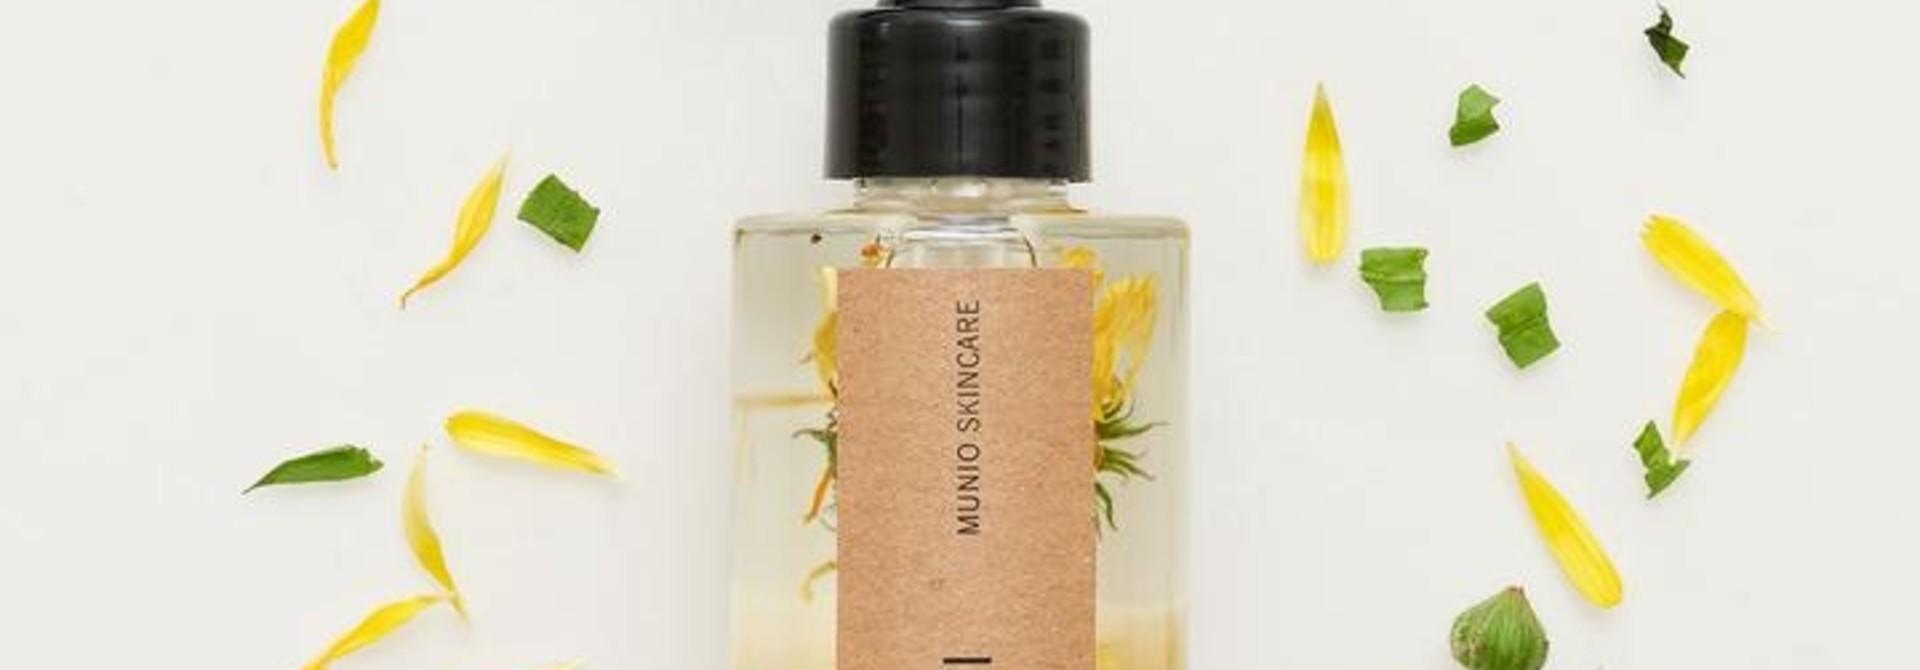 Marigold Organic Body Oil